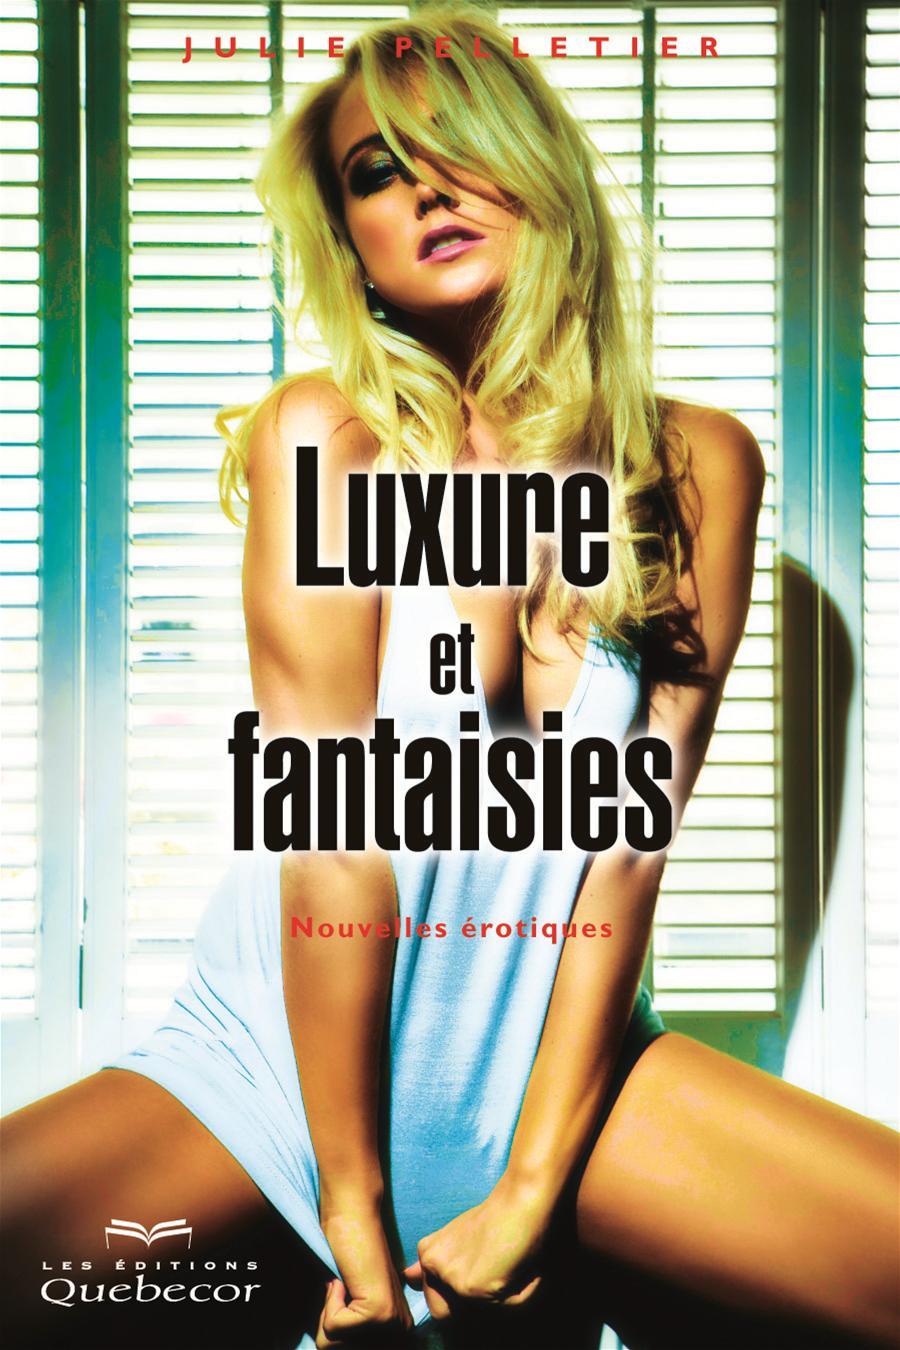 Luxure et fantaisies